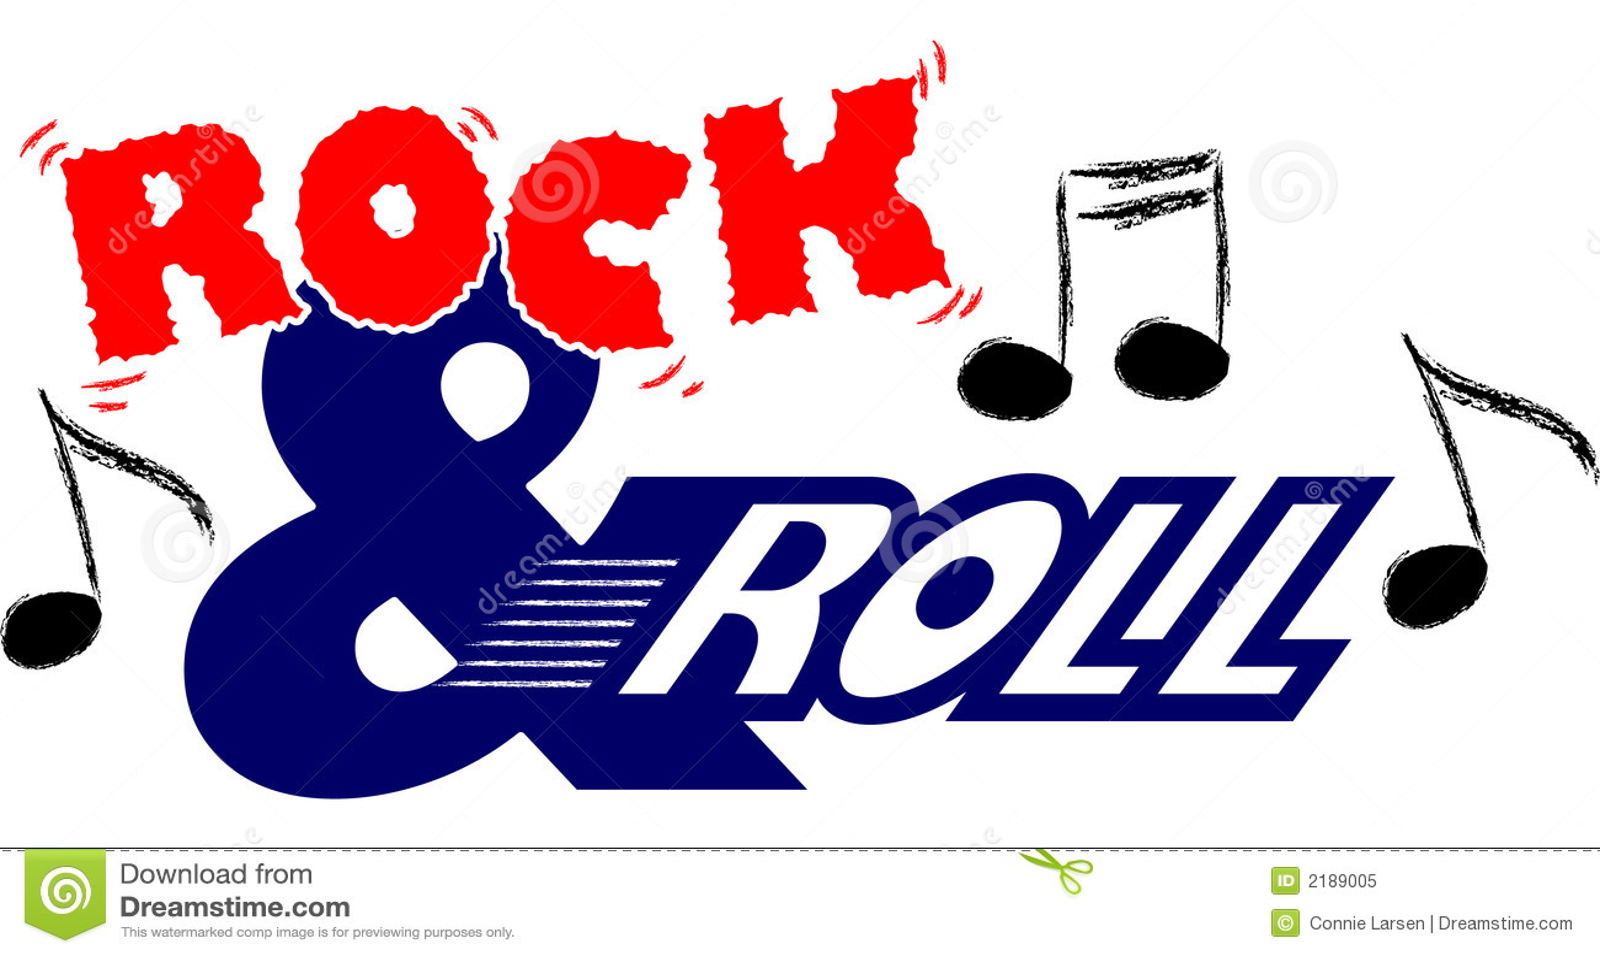 Música do rock and roll/eps